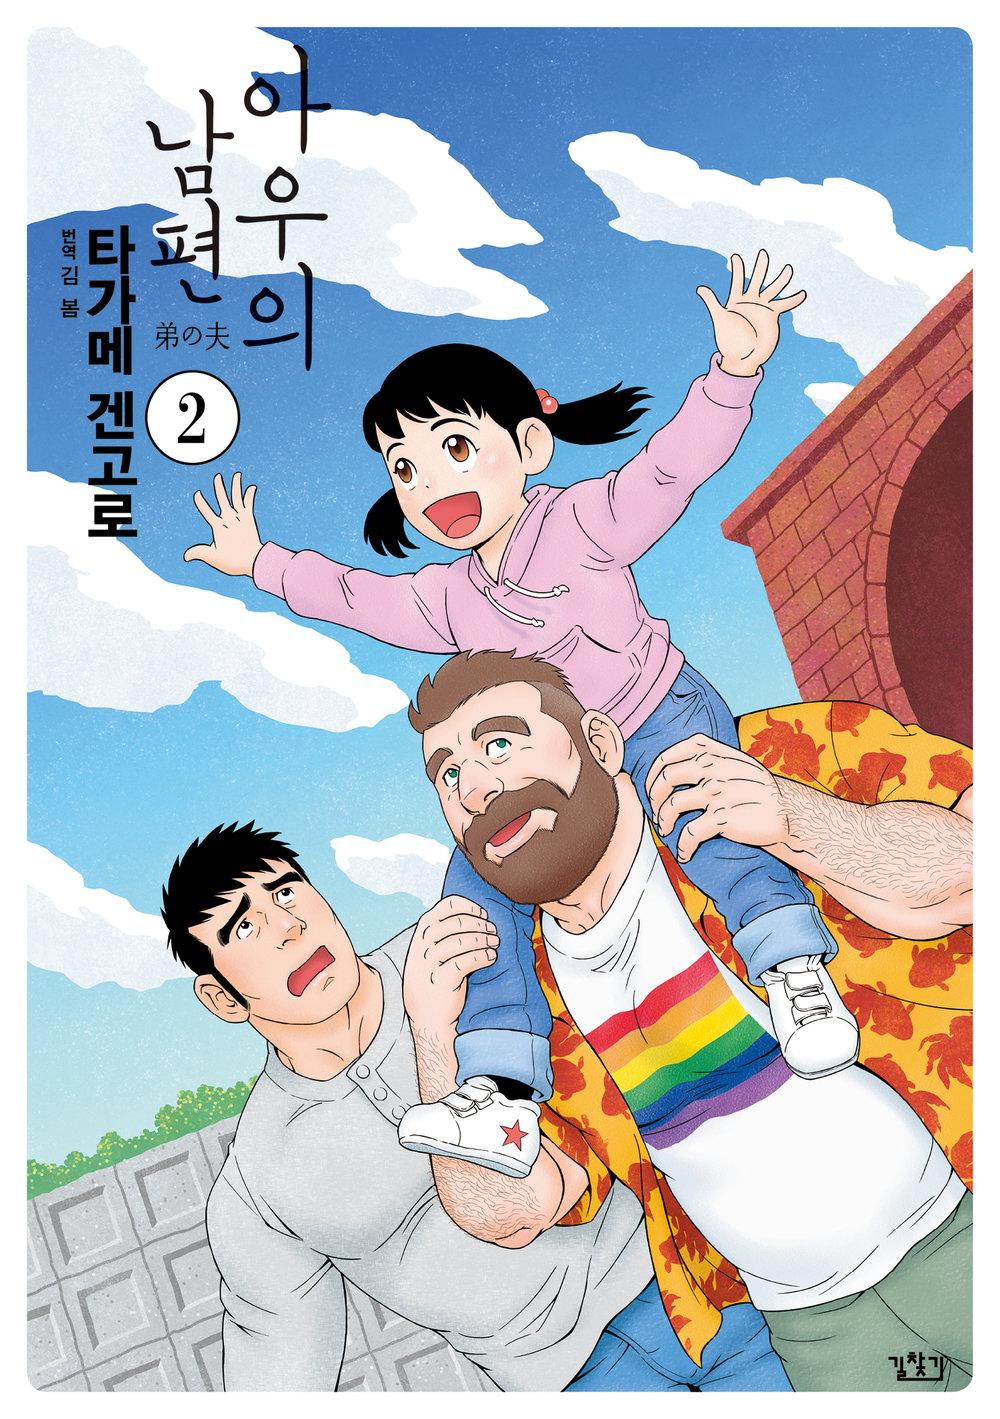 © Tagame Gengoroh / 제공: 도서출판 길찾기